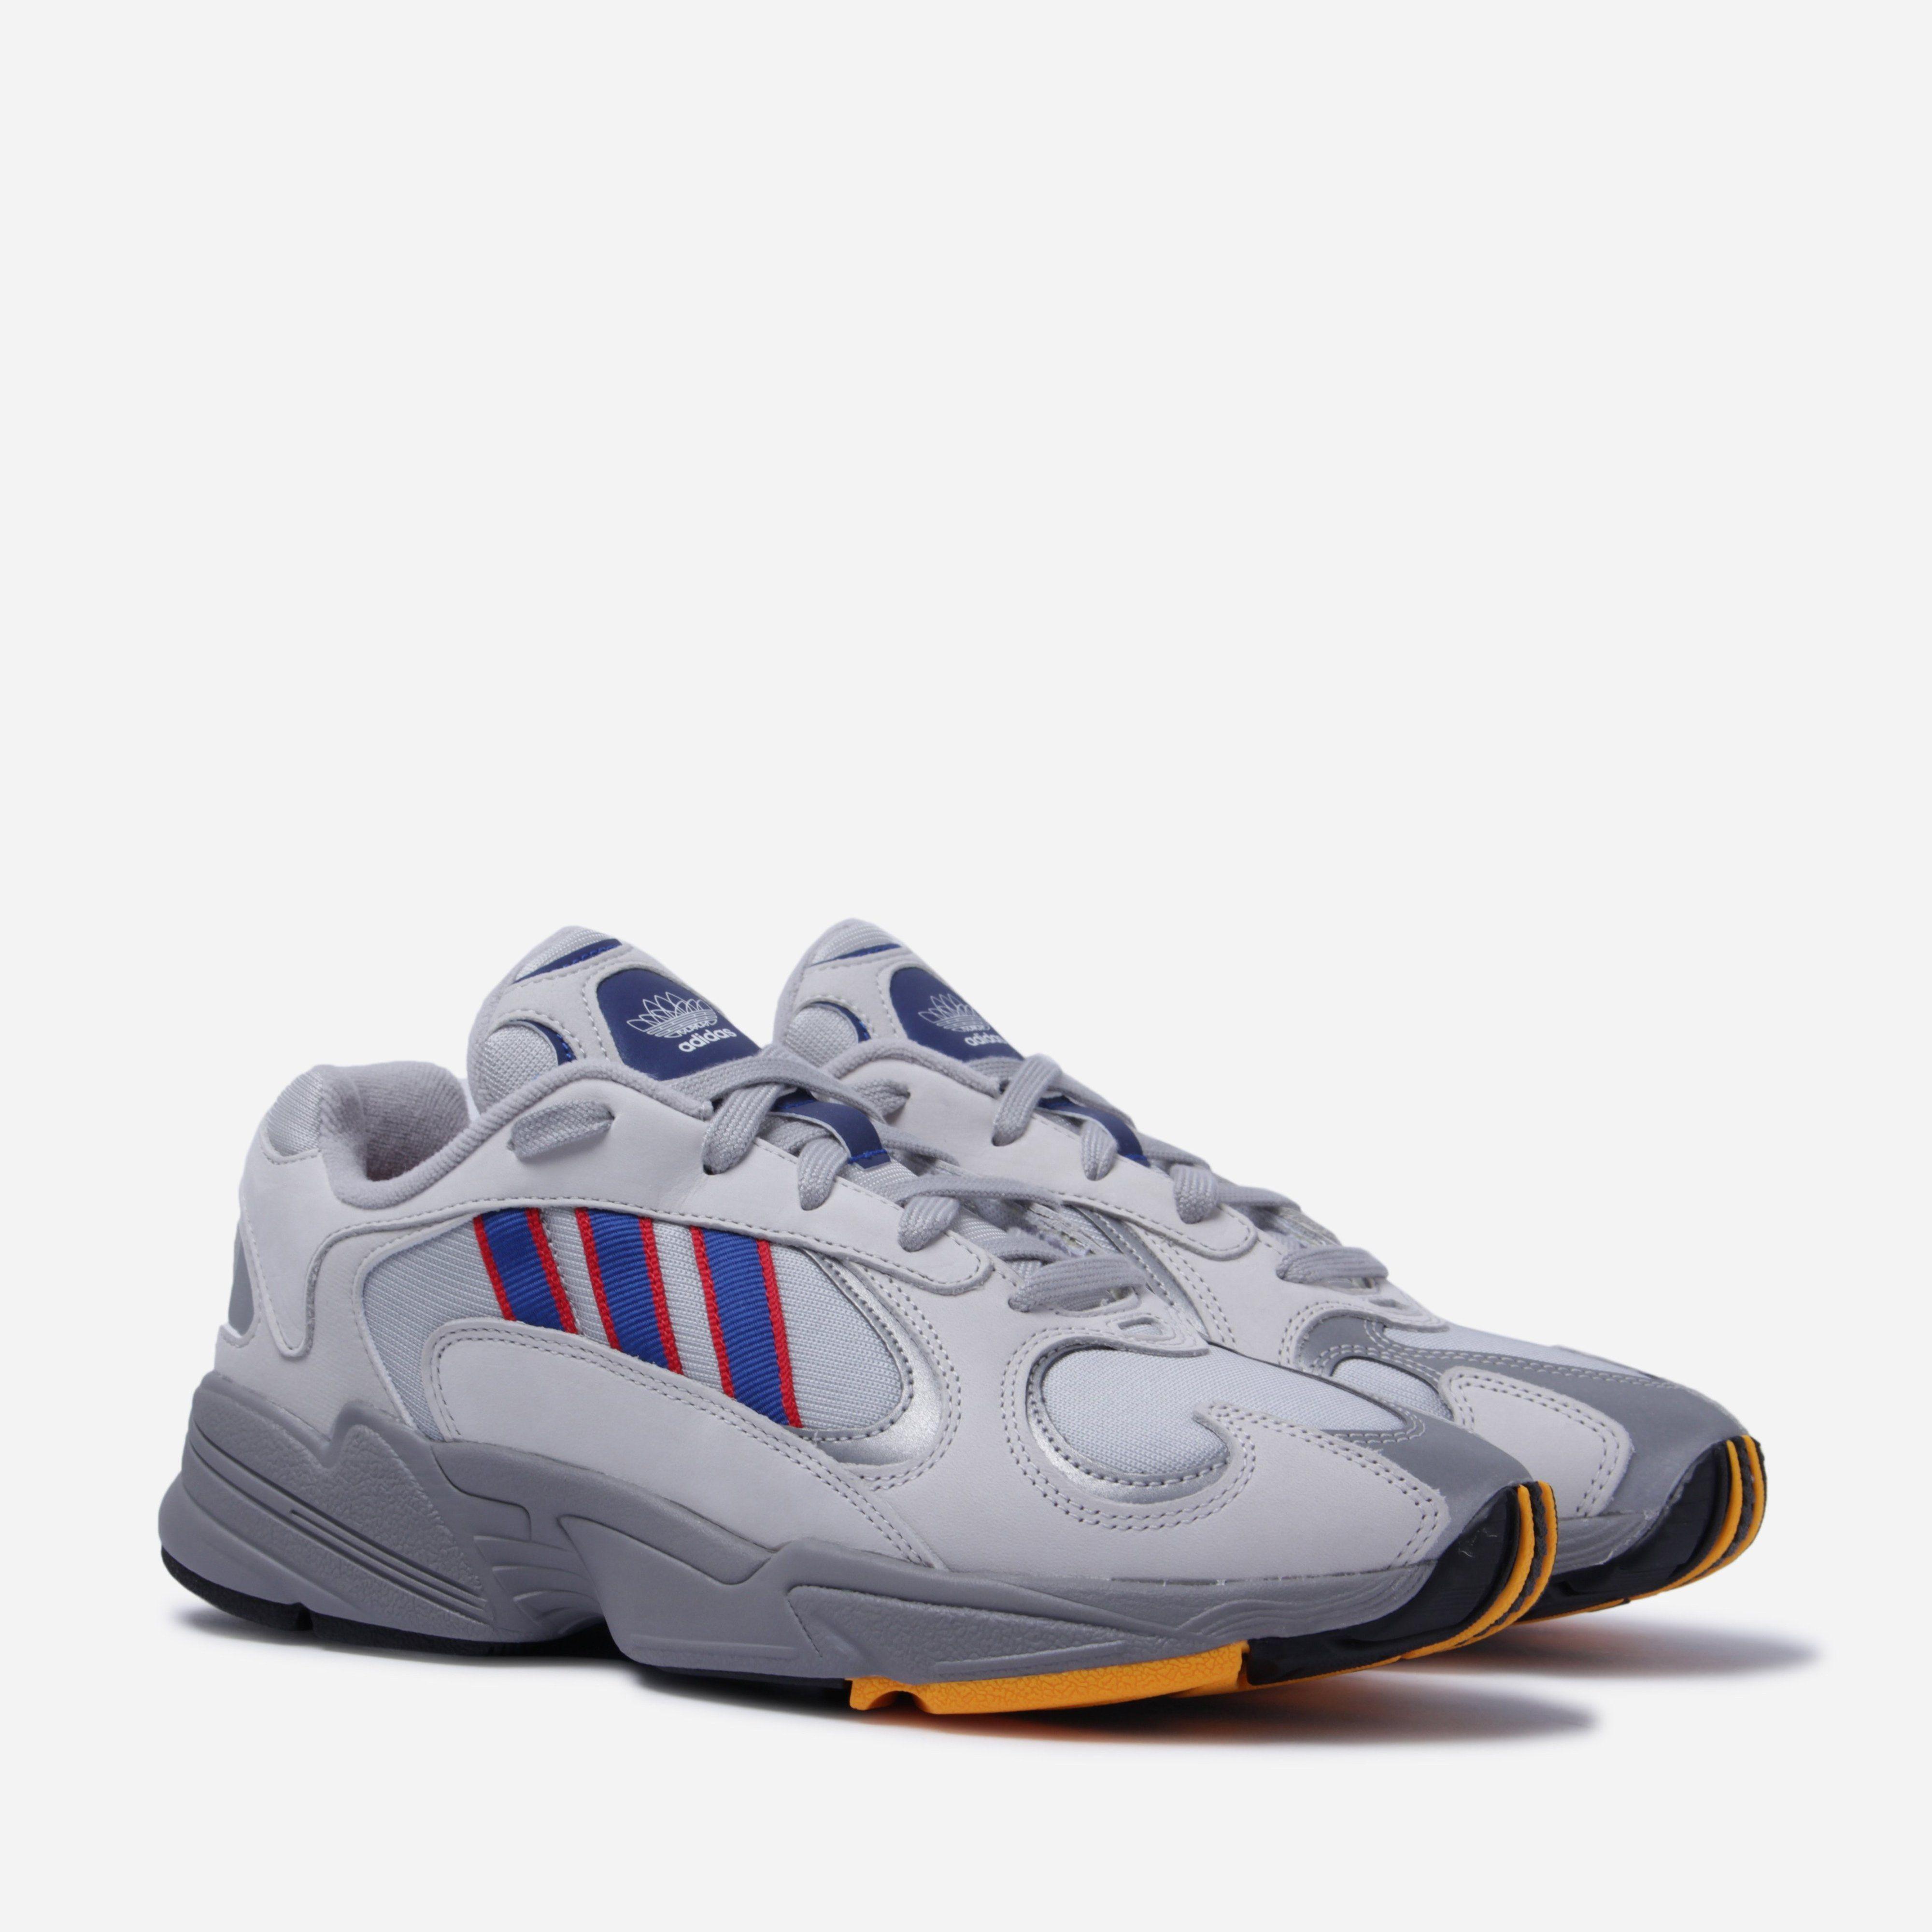 adidas Originals CG7127 YUNG-1